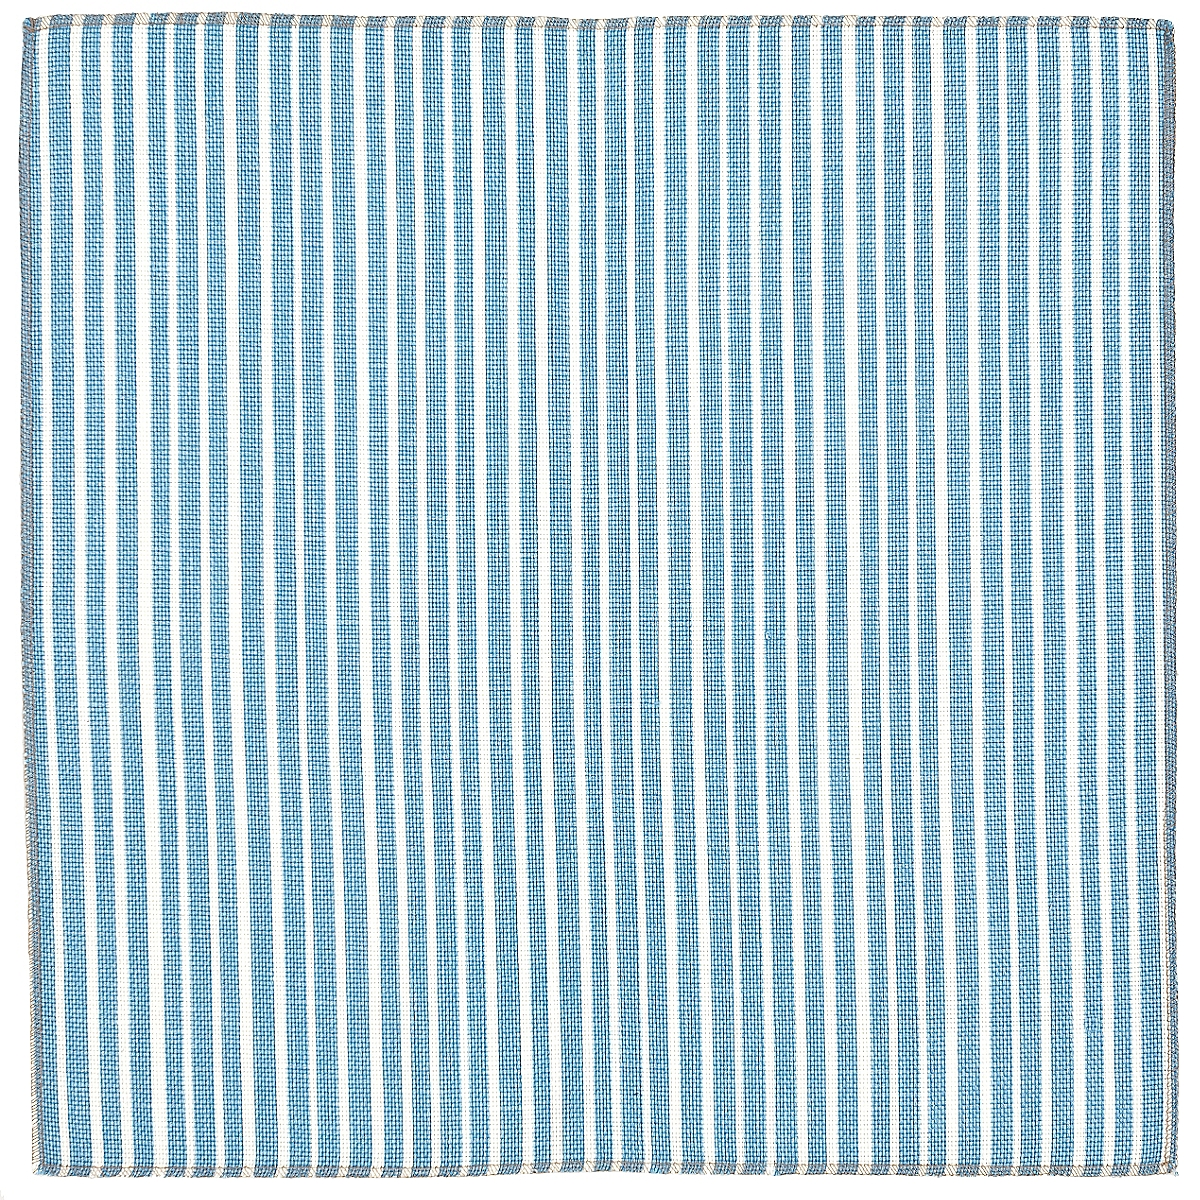 Stripe Tease: True Blue (fabric yardage)